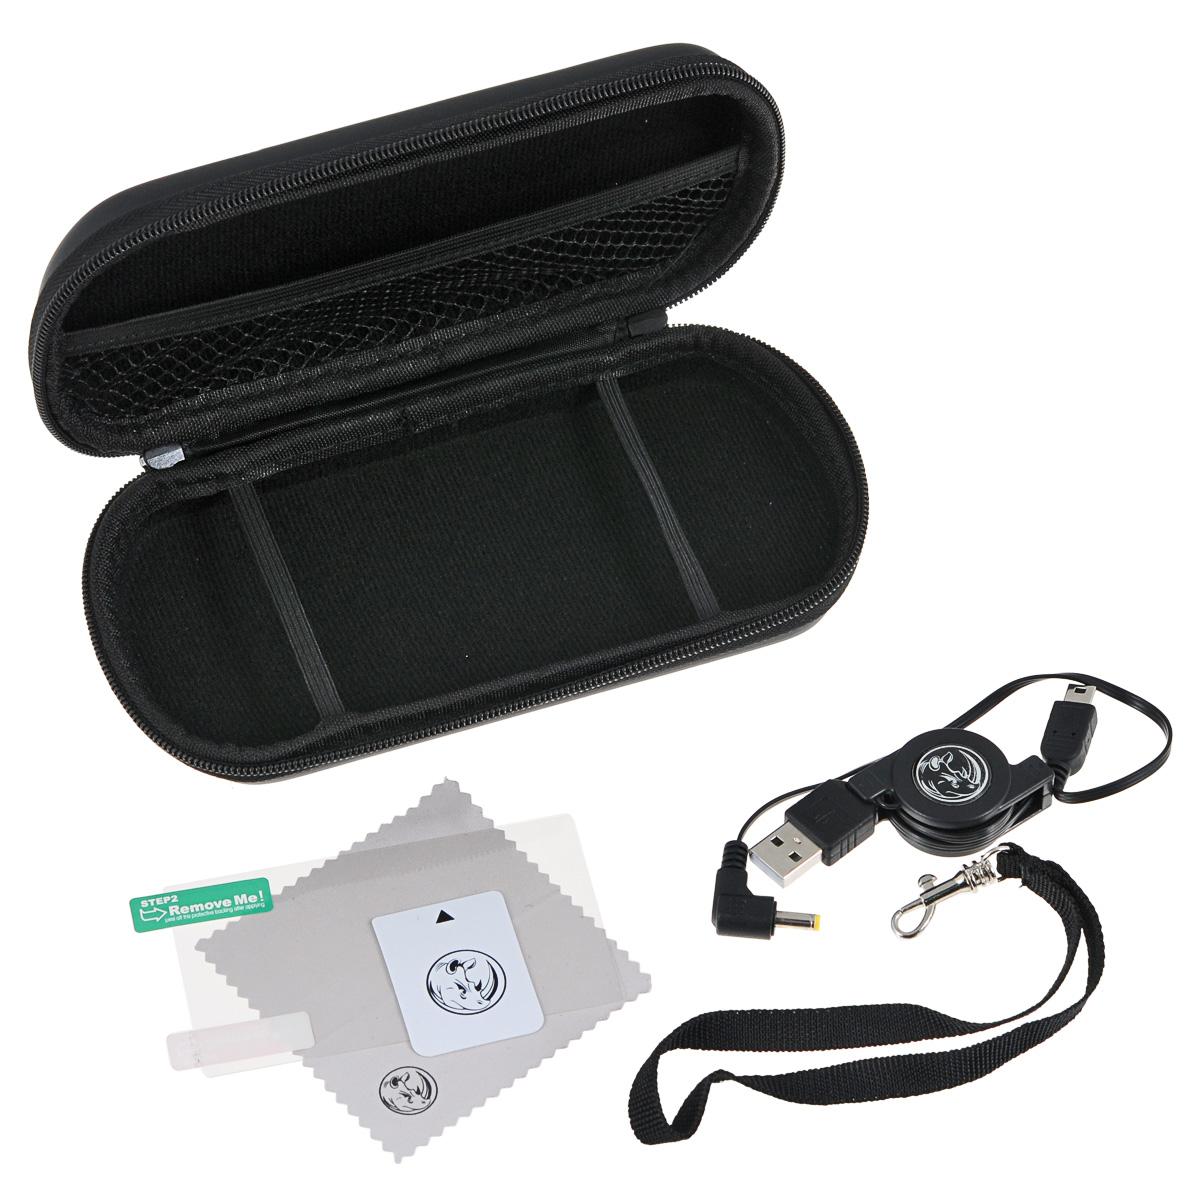 Black Horns Kit 5 in 1 набор аксессуаров для Sony PSP E1000/2000/3000 разветвитель usb black horns для ps4